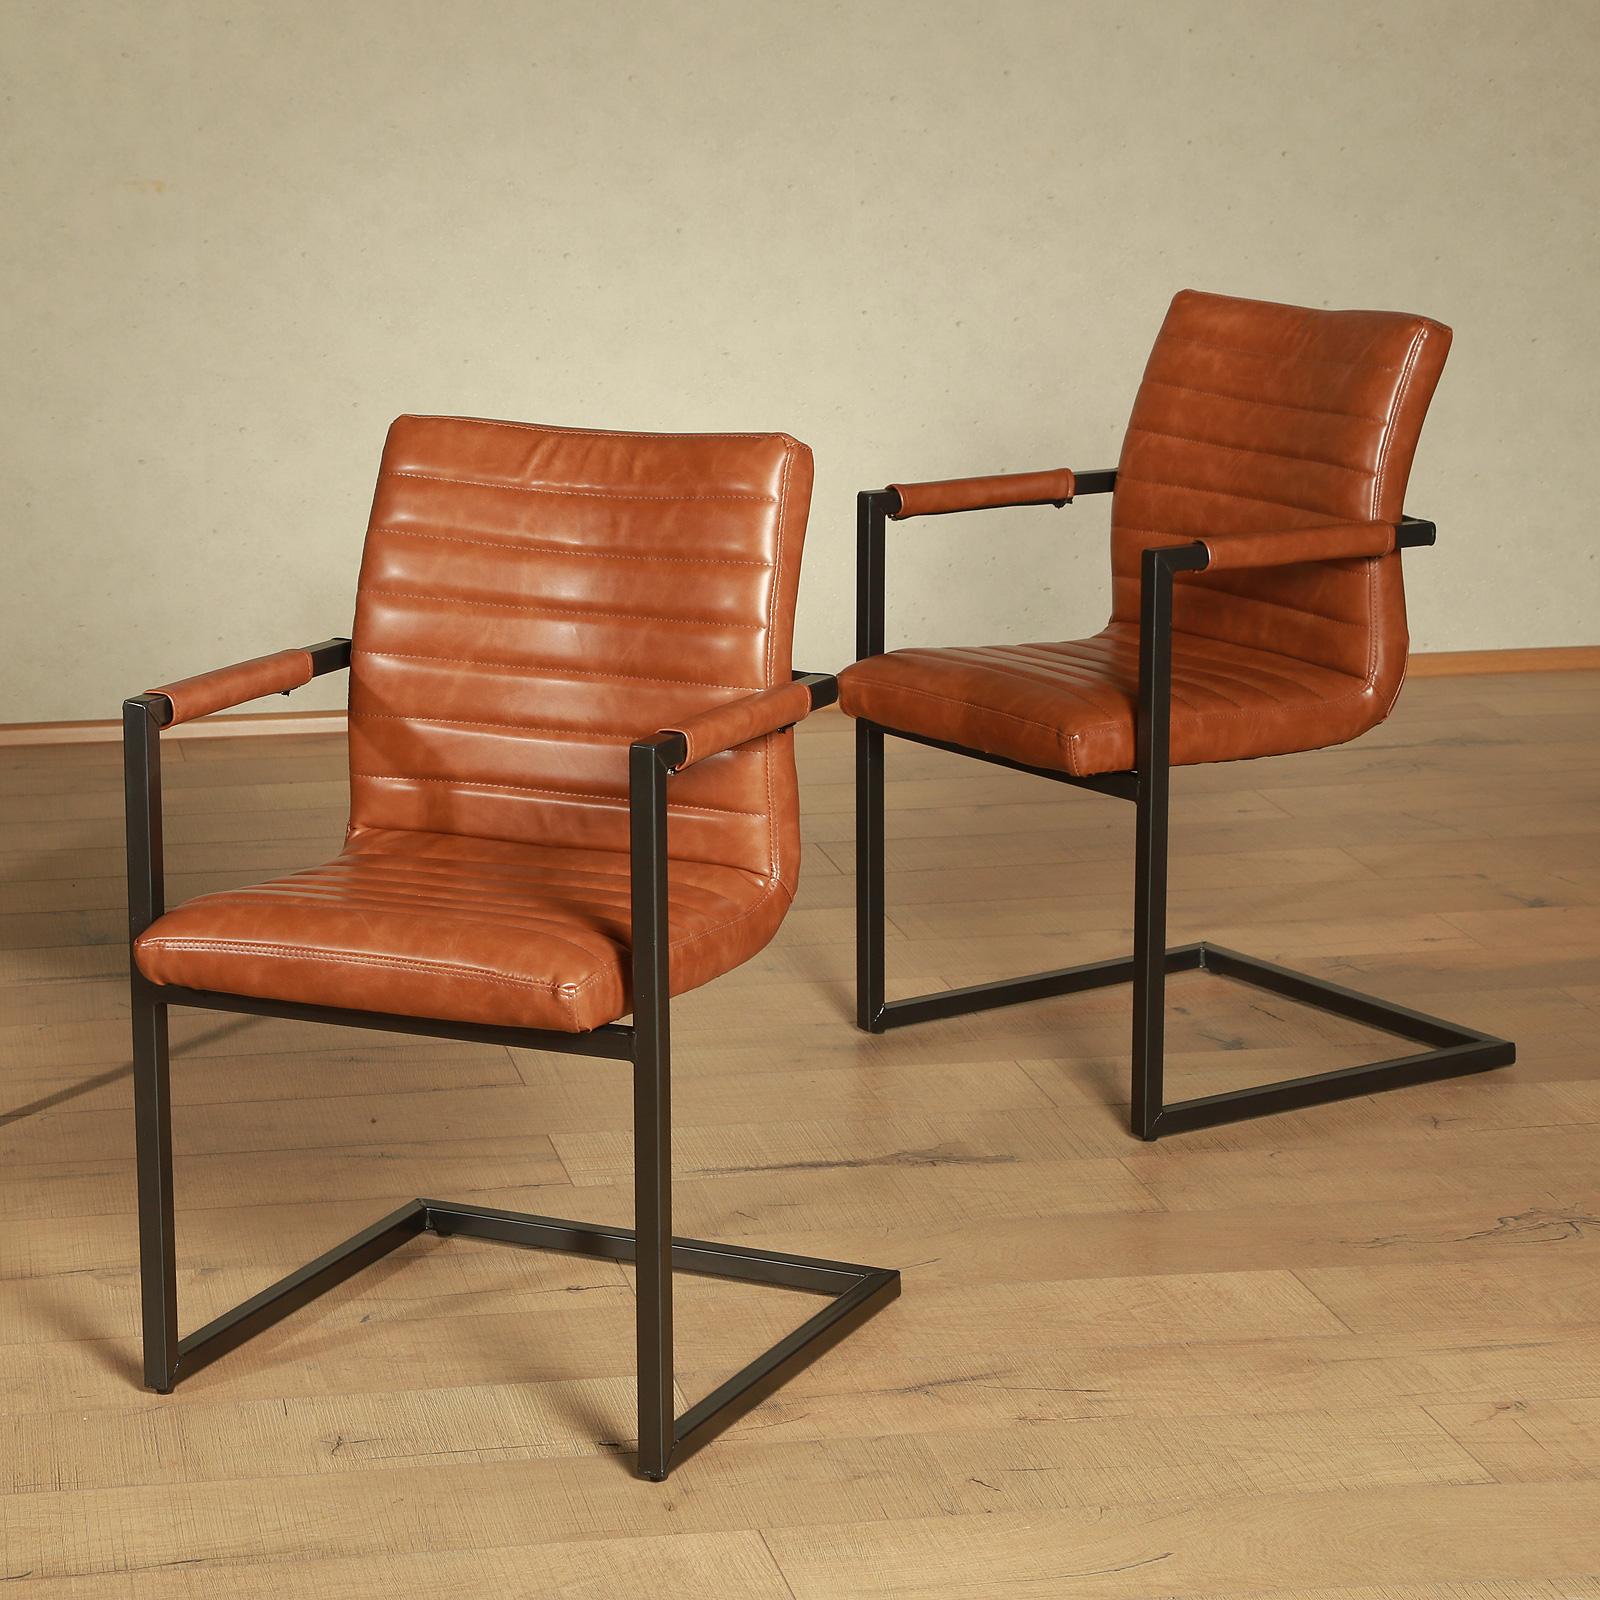 schwingstuhl parzival 2er set stuhl farbauswahl gestell eisen grau mit armlehne ebay. Black Bedroom Furniture Sets. Home Design Ideas